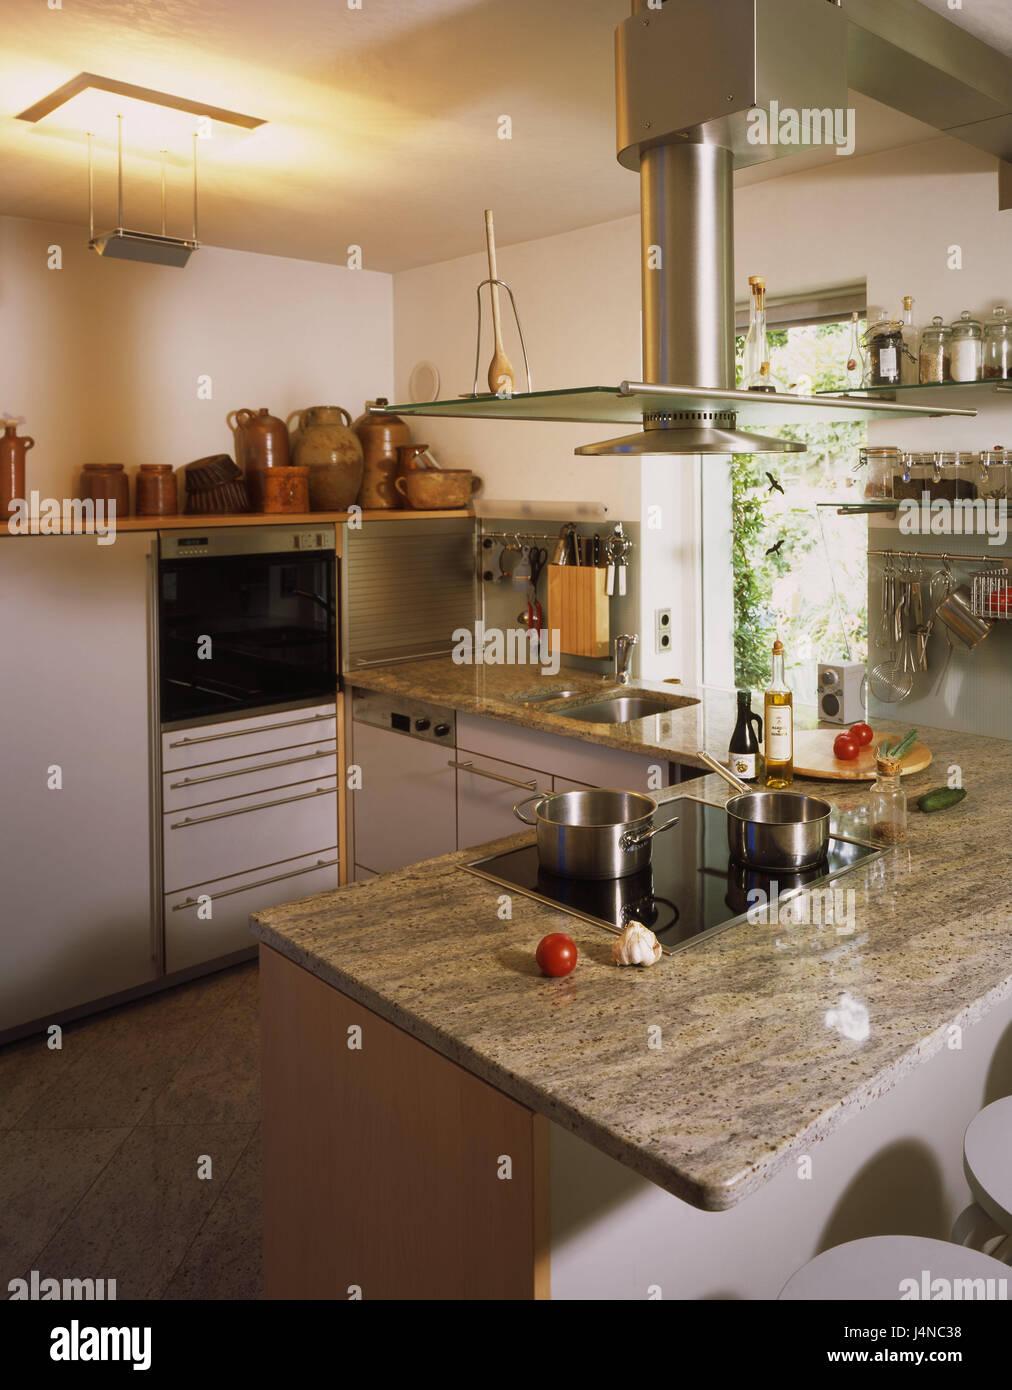 Modern Kitchen Unit cuisine, setup, modern, kitchen-living room, cooking island